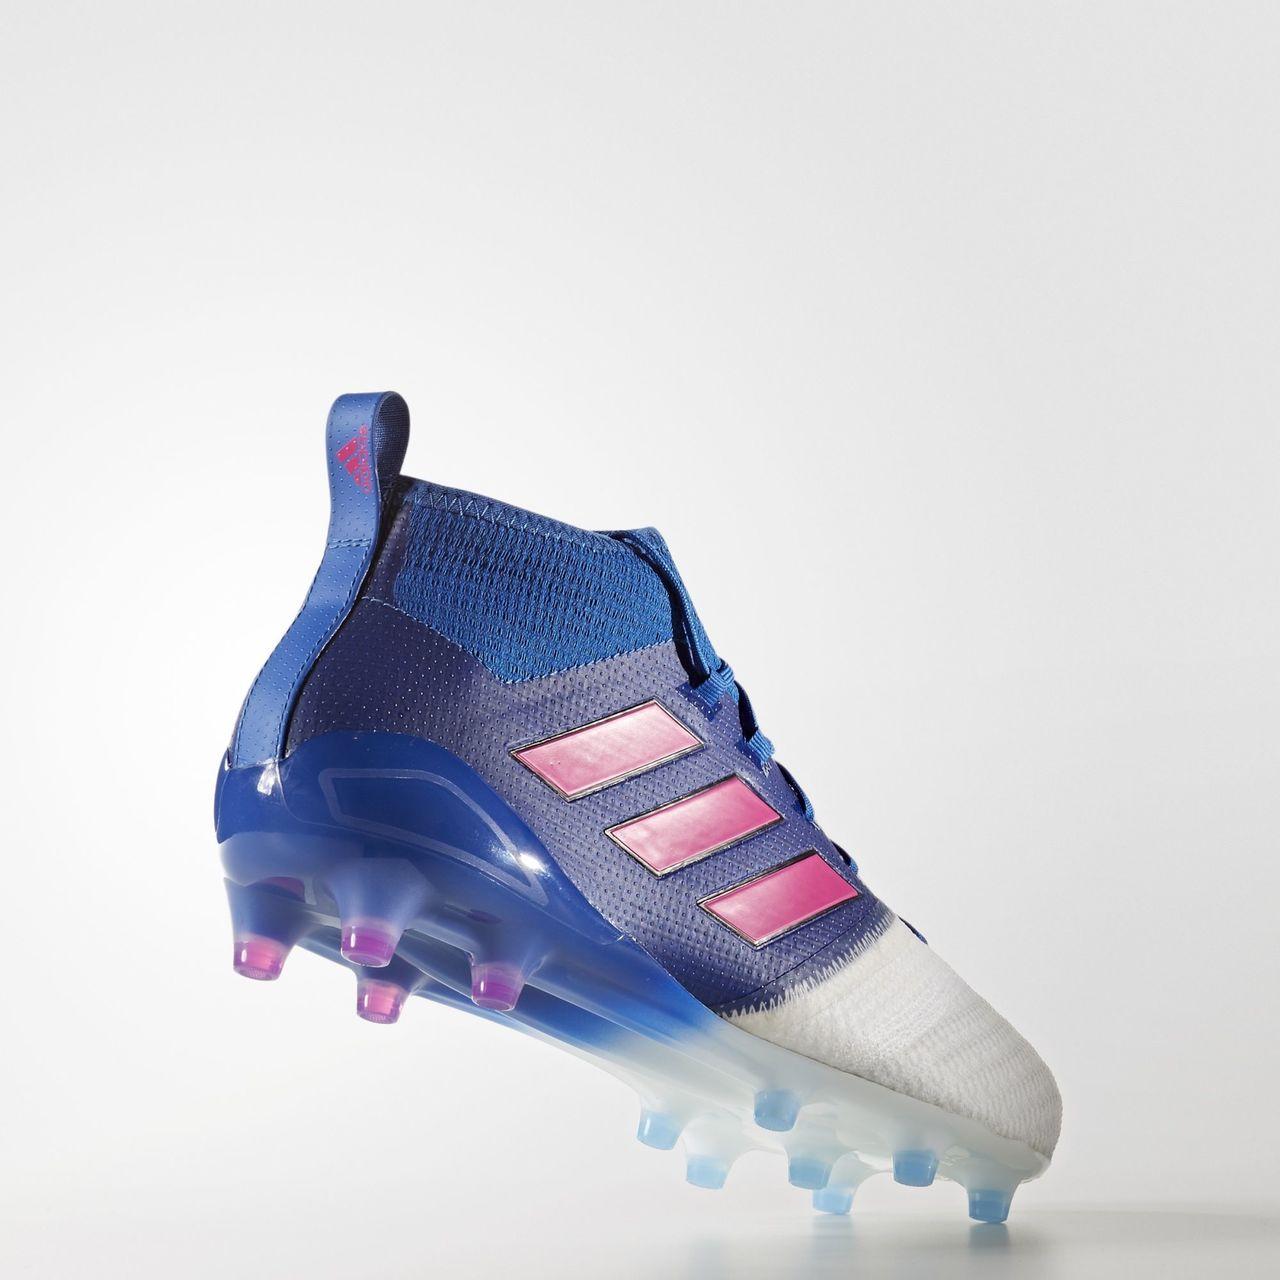 2a7272d805eb adidas ACE 17.1 Leather FG - Blue Shock Pink White .  http   www.footballshirtculture.com Football-boots adidas- ...